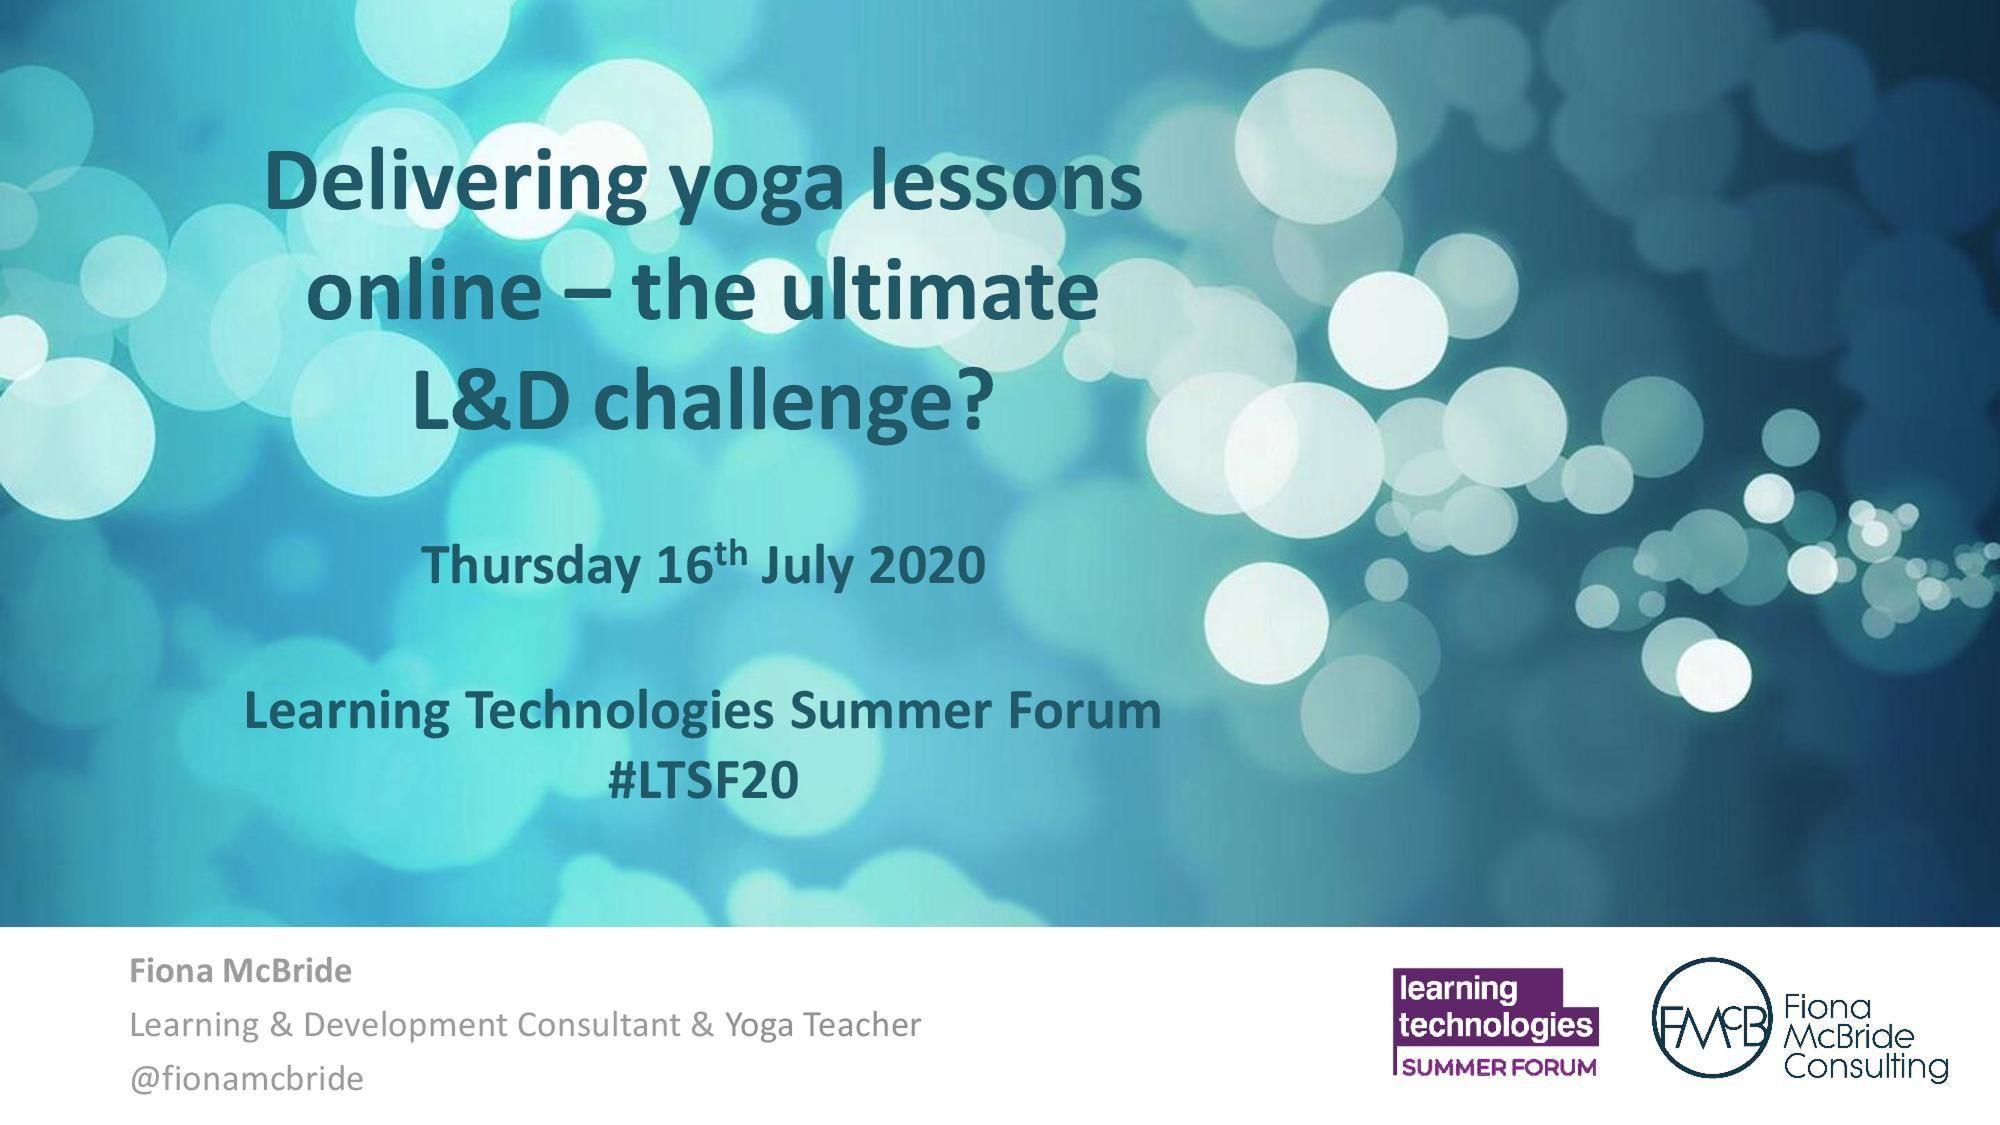 Delivering yoga lessons online - the ultimate L&D challenge?